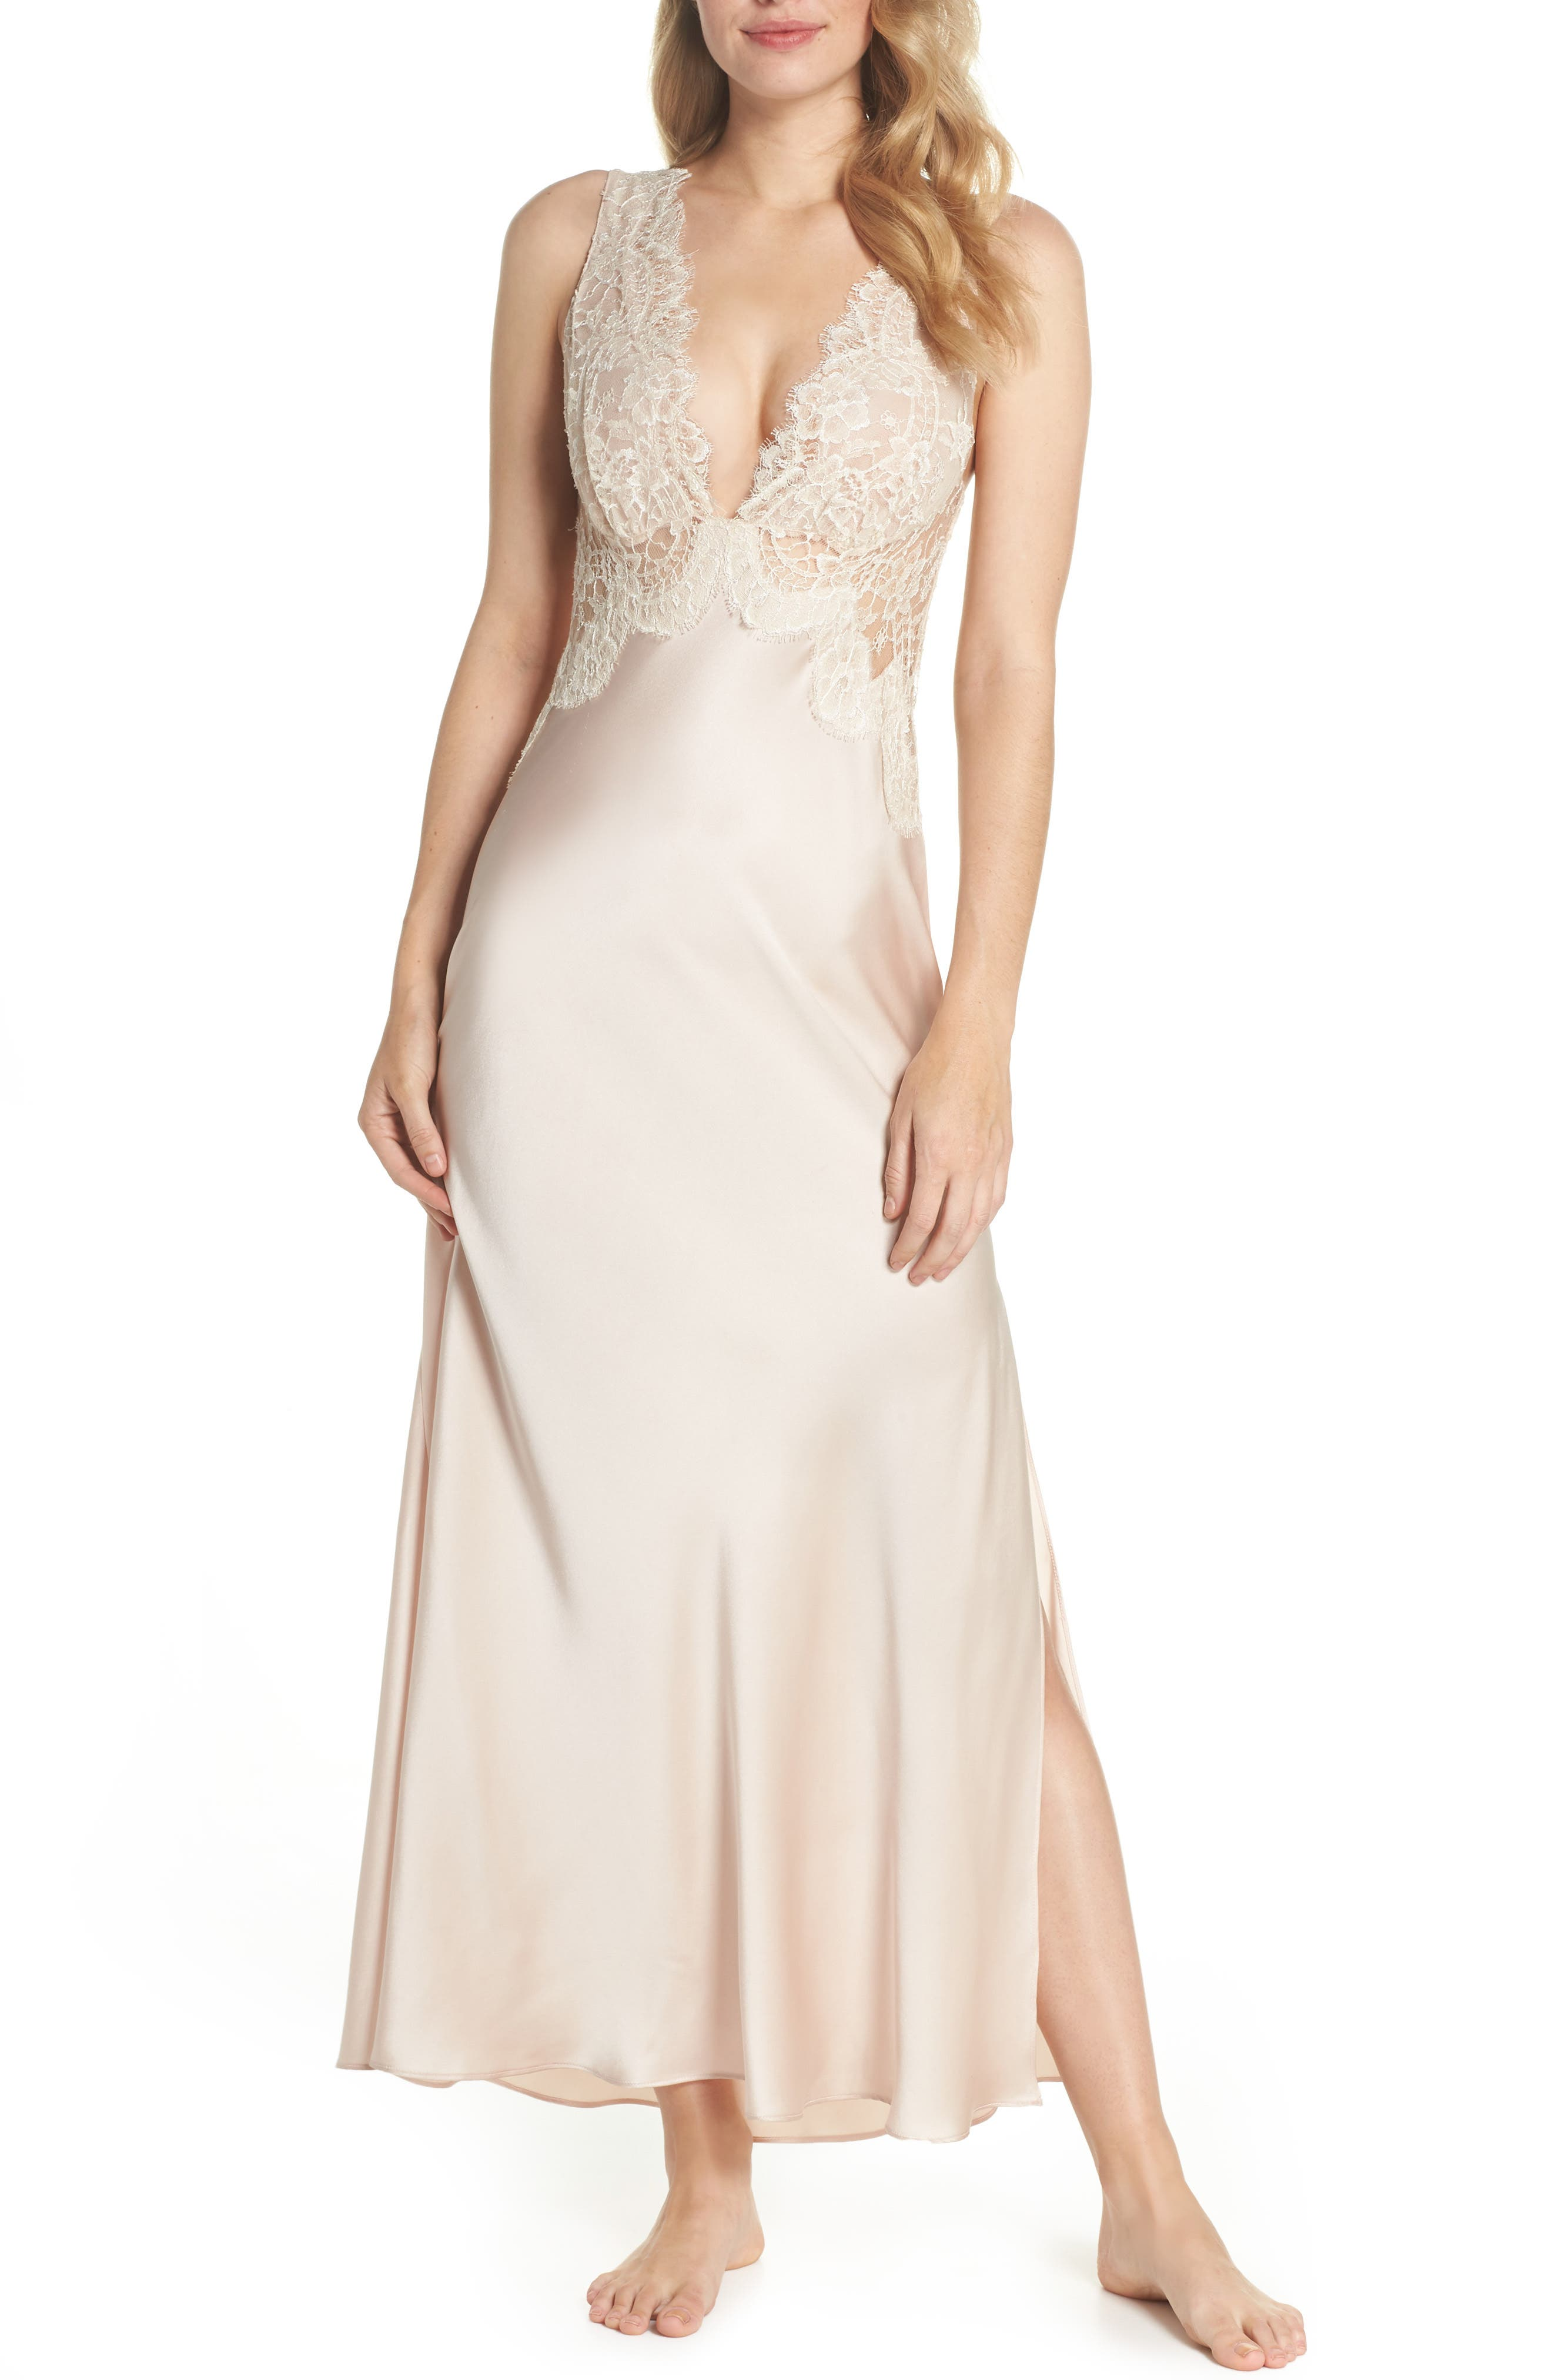 Christine Lingerie Lace Trim Silk Nightgown, Size Petite - Pink